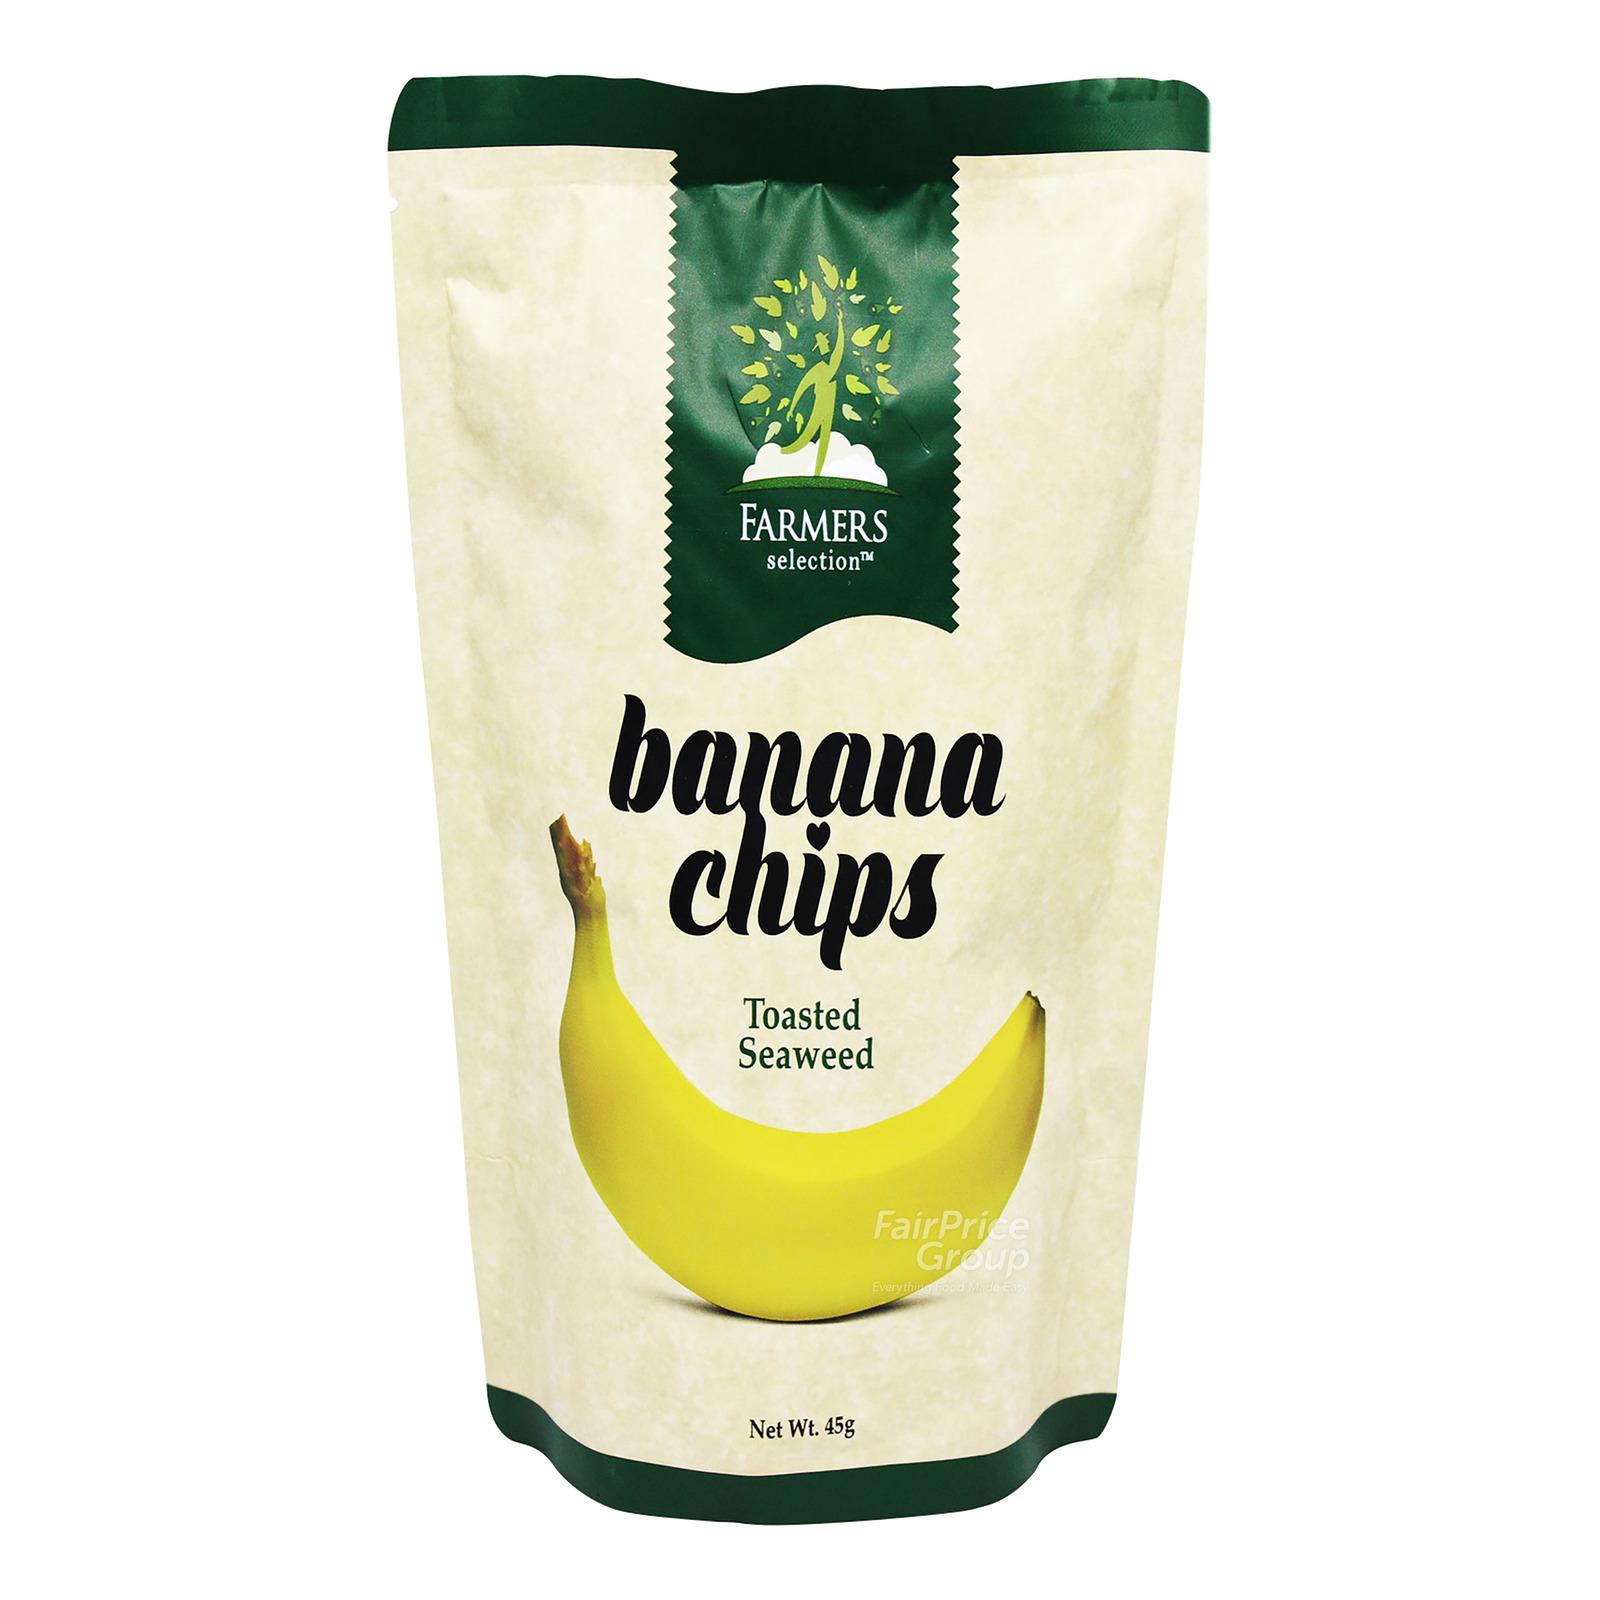 Farmers Selection Banana Chips - Toasted Seaweed